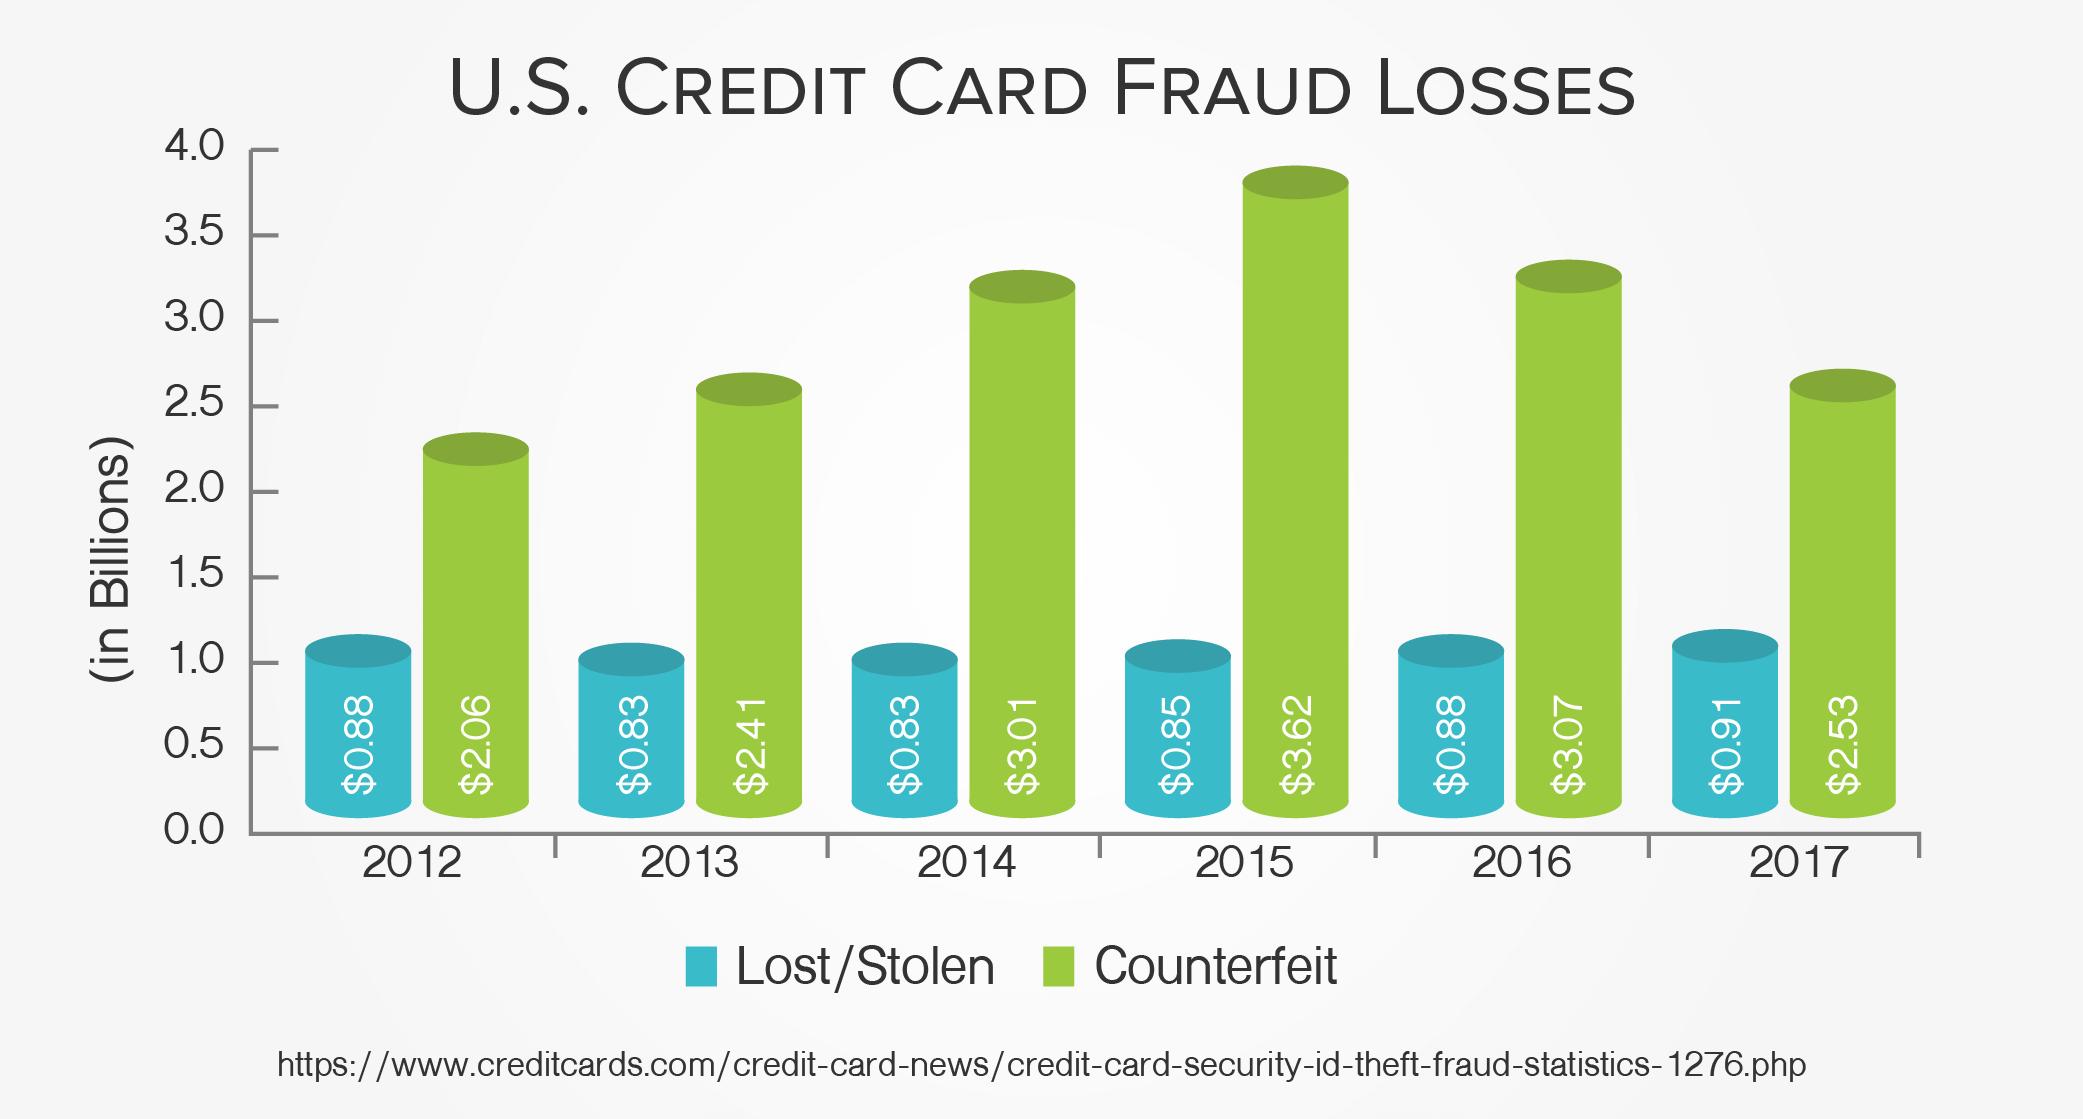 US Credit Card Fraud Losses